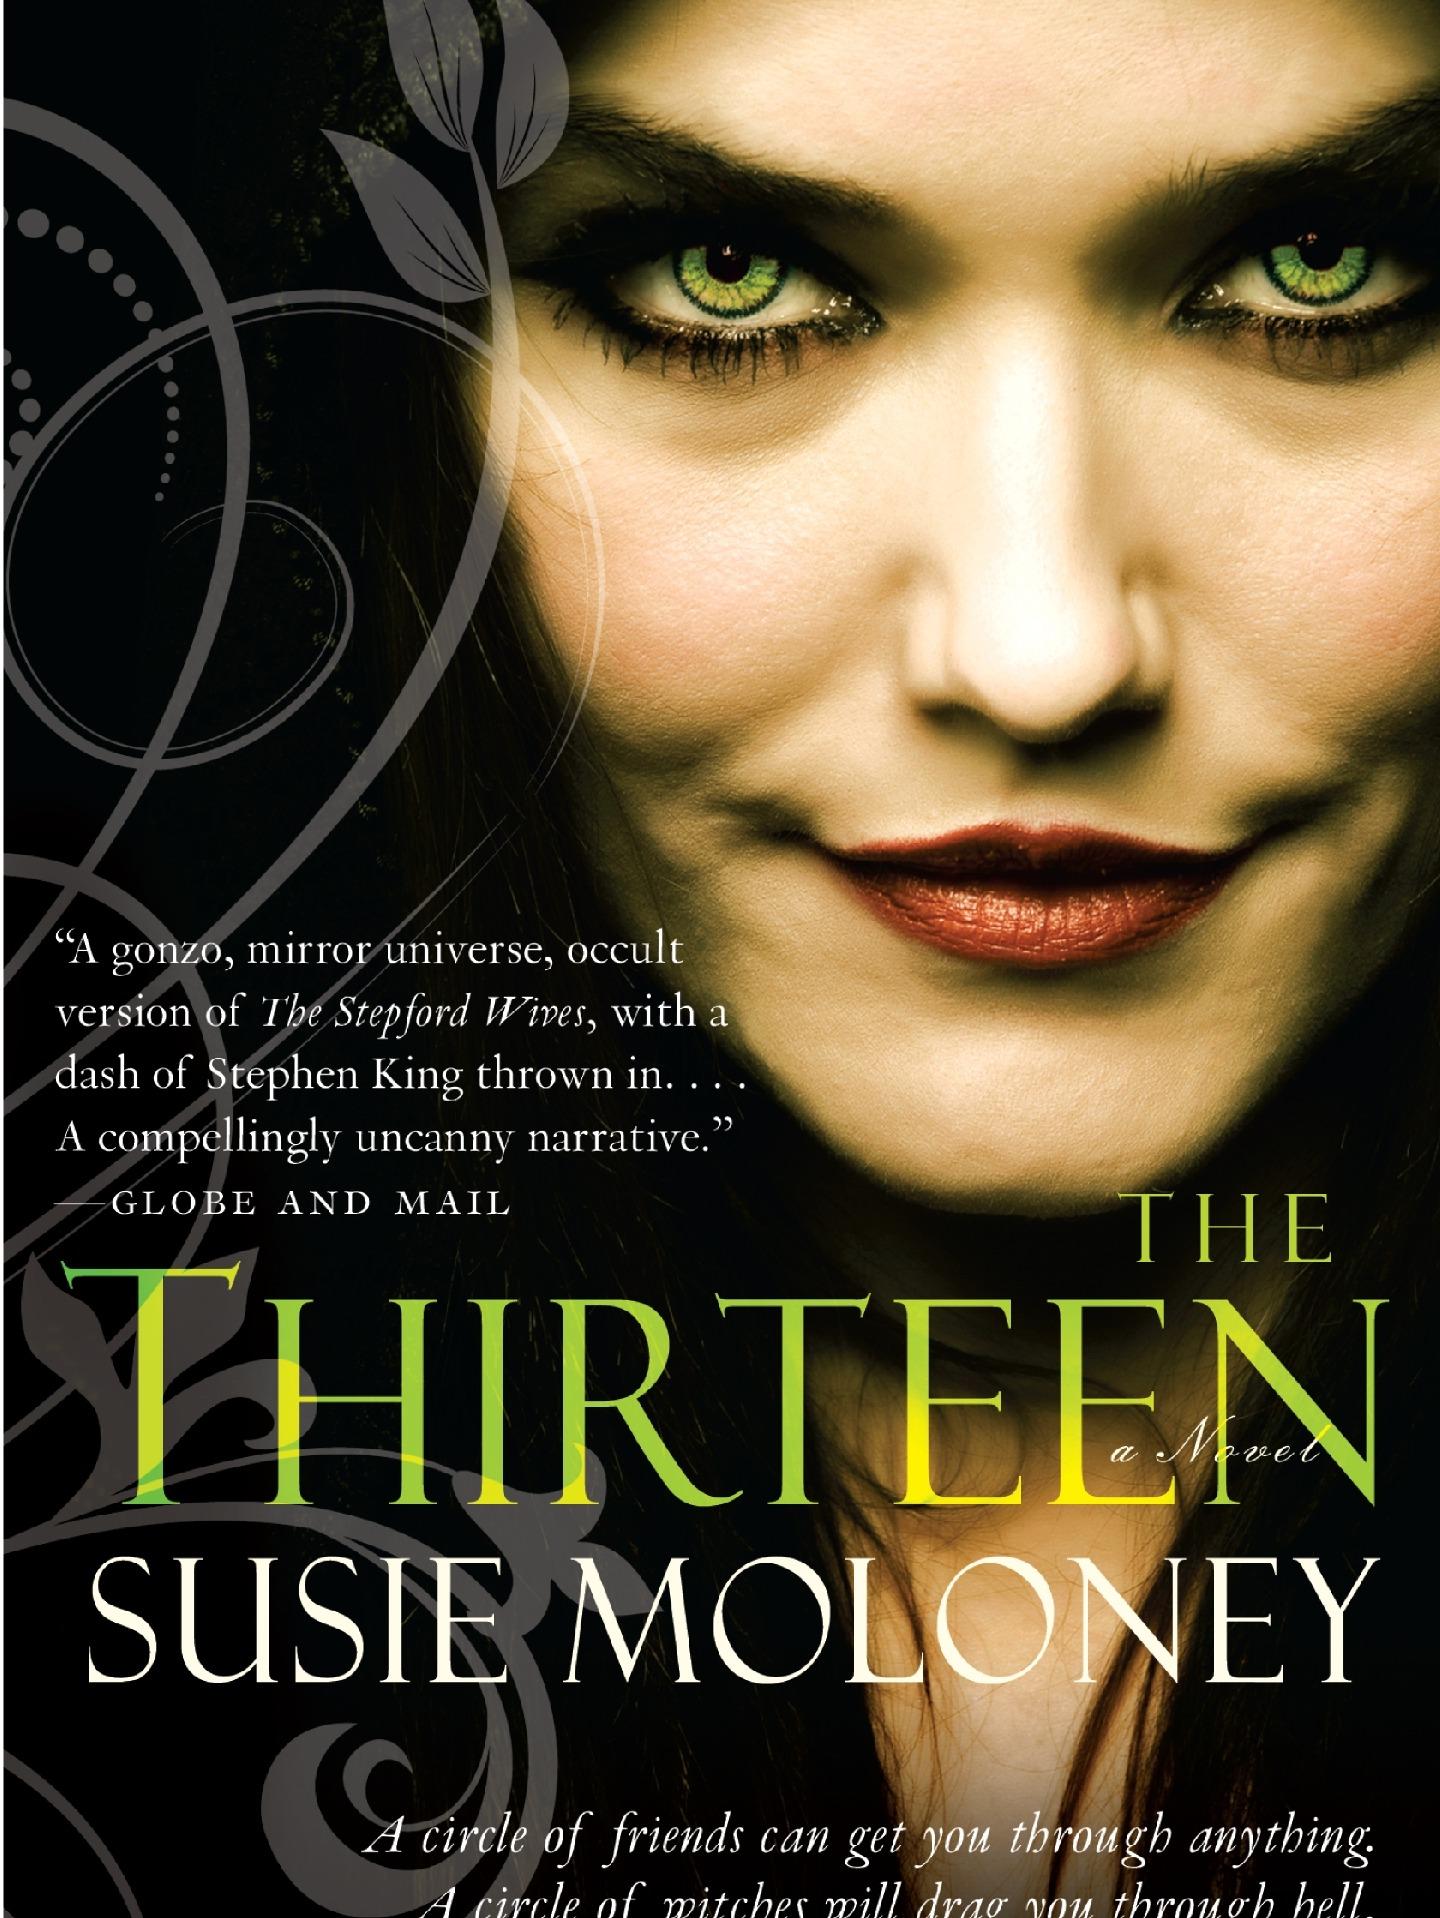 The Thirteen by Susie Maloney